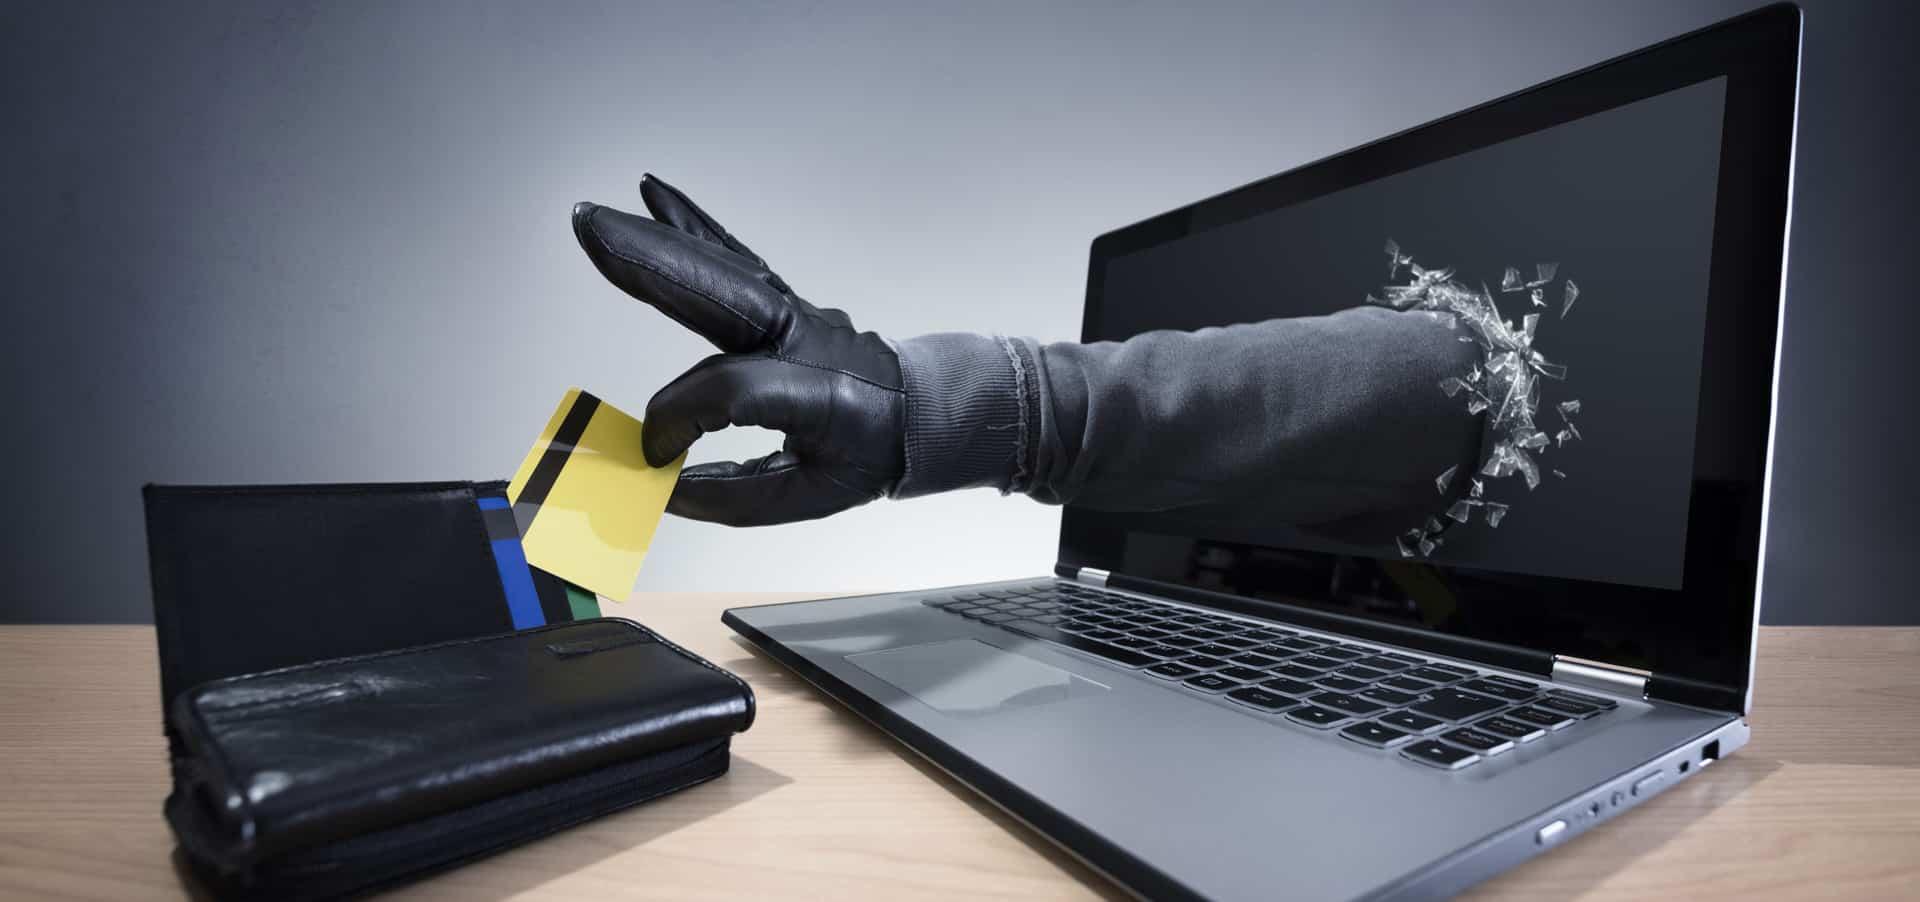 Employment Identity Theft